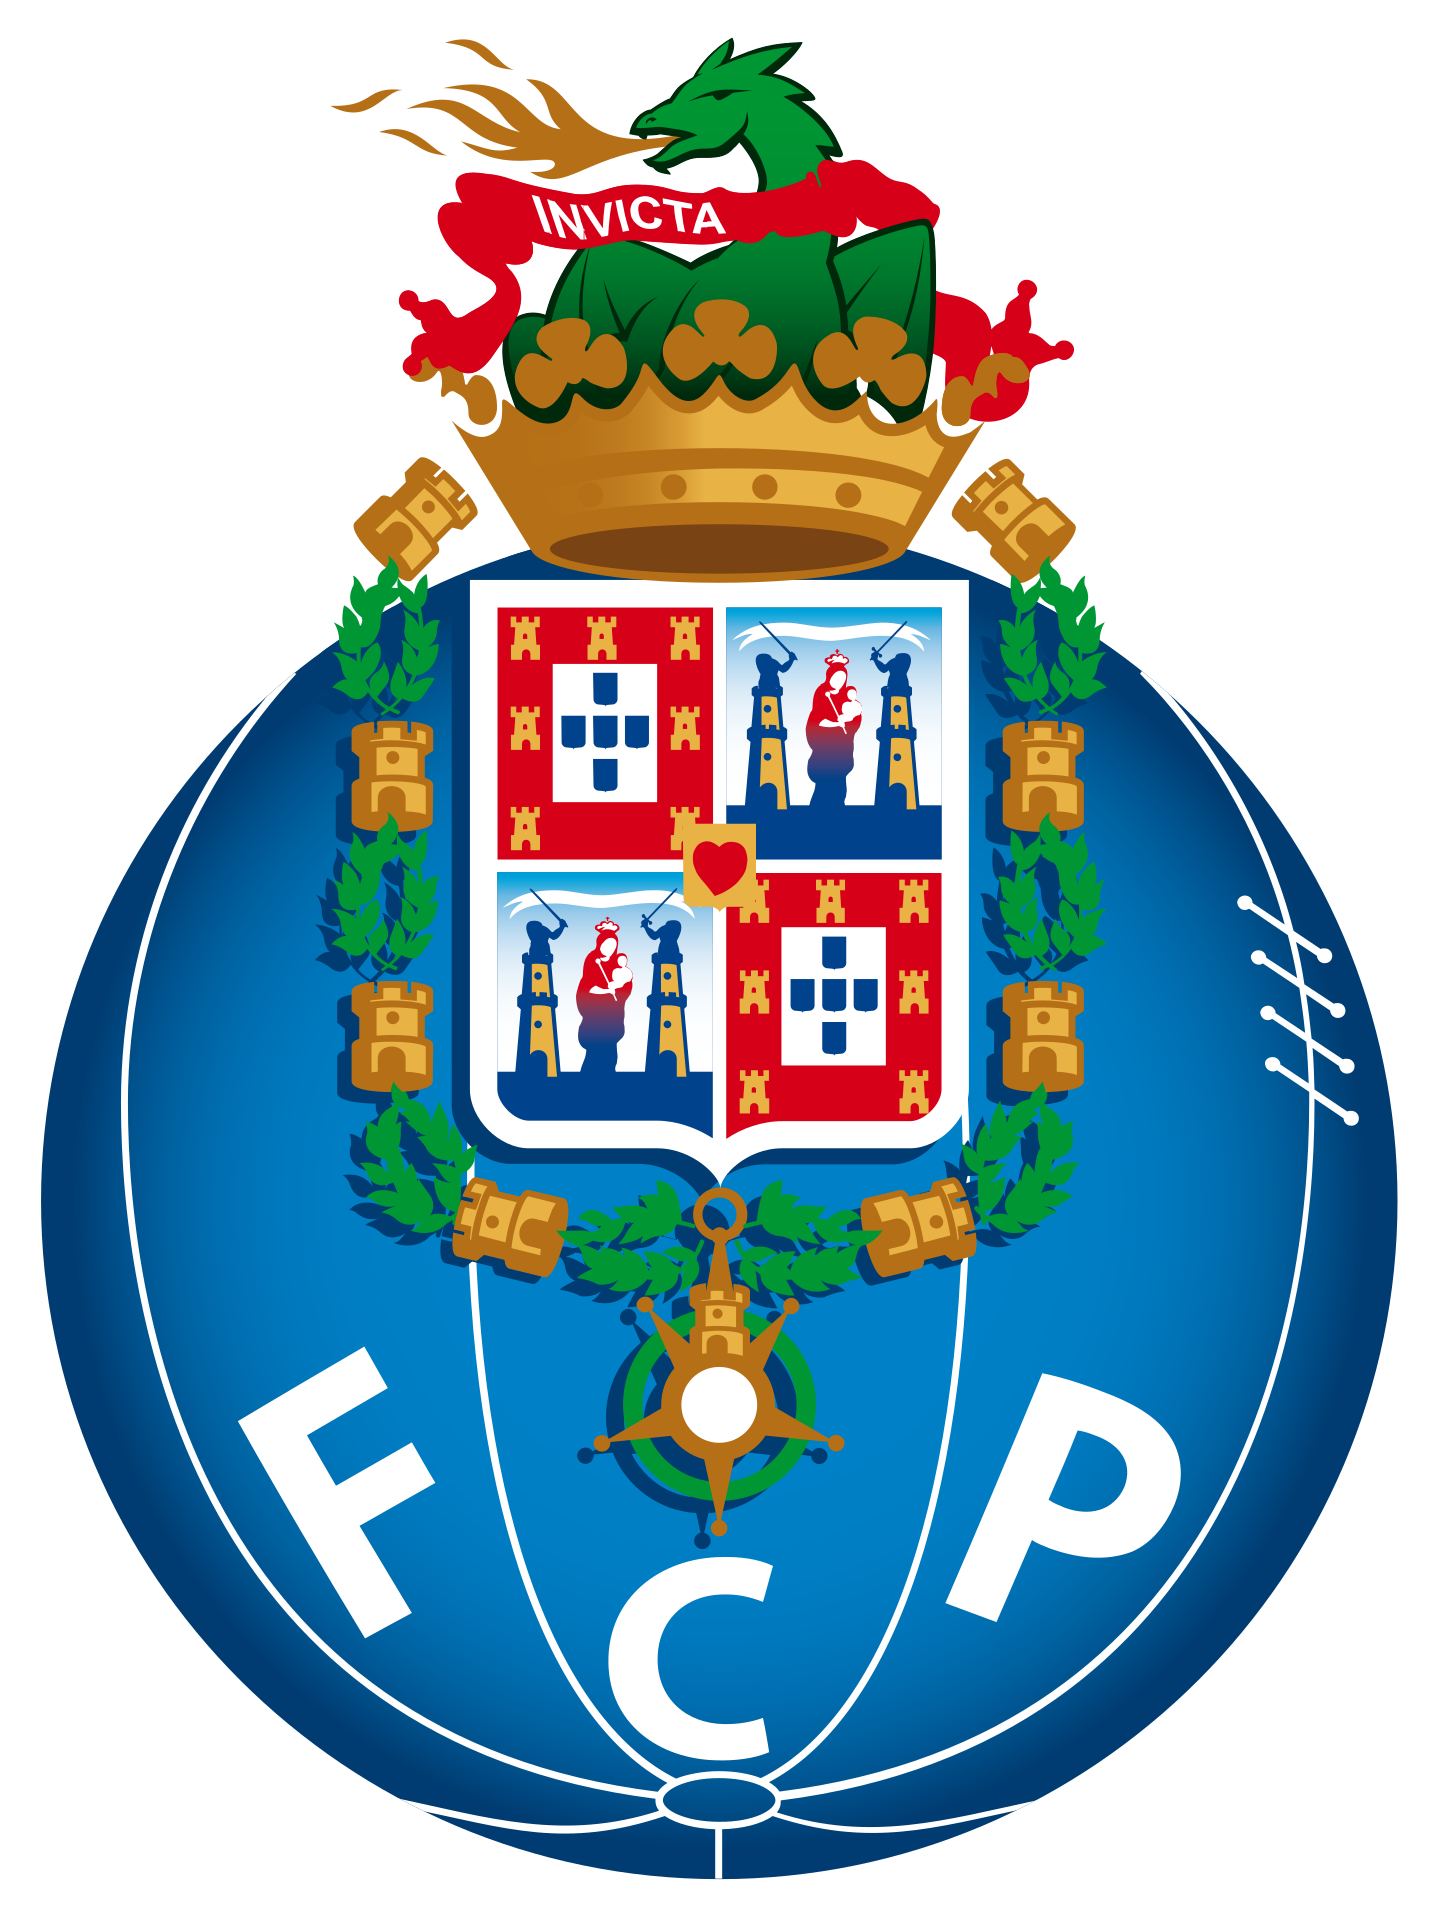 fc porto logo 2 - FC Porto Logo